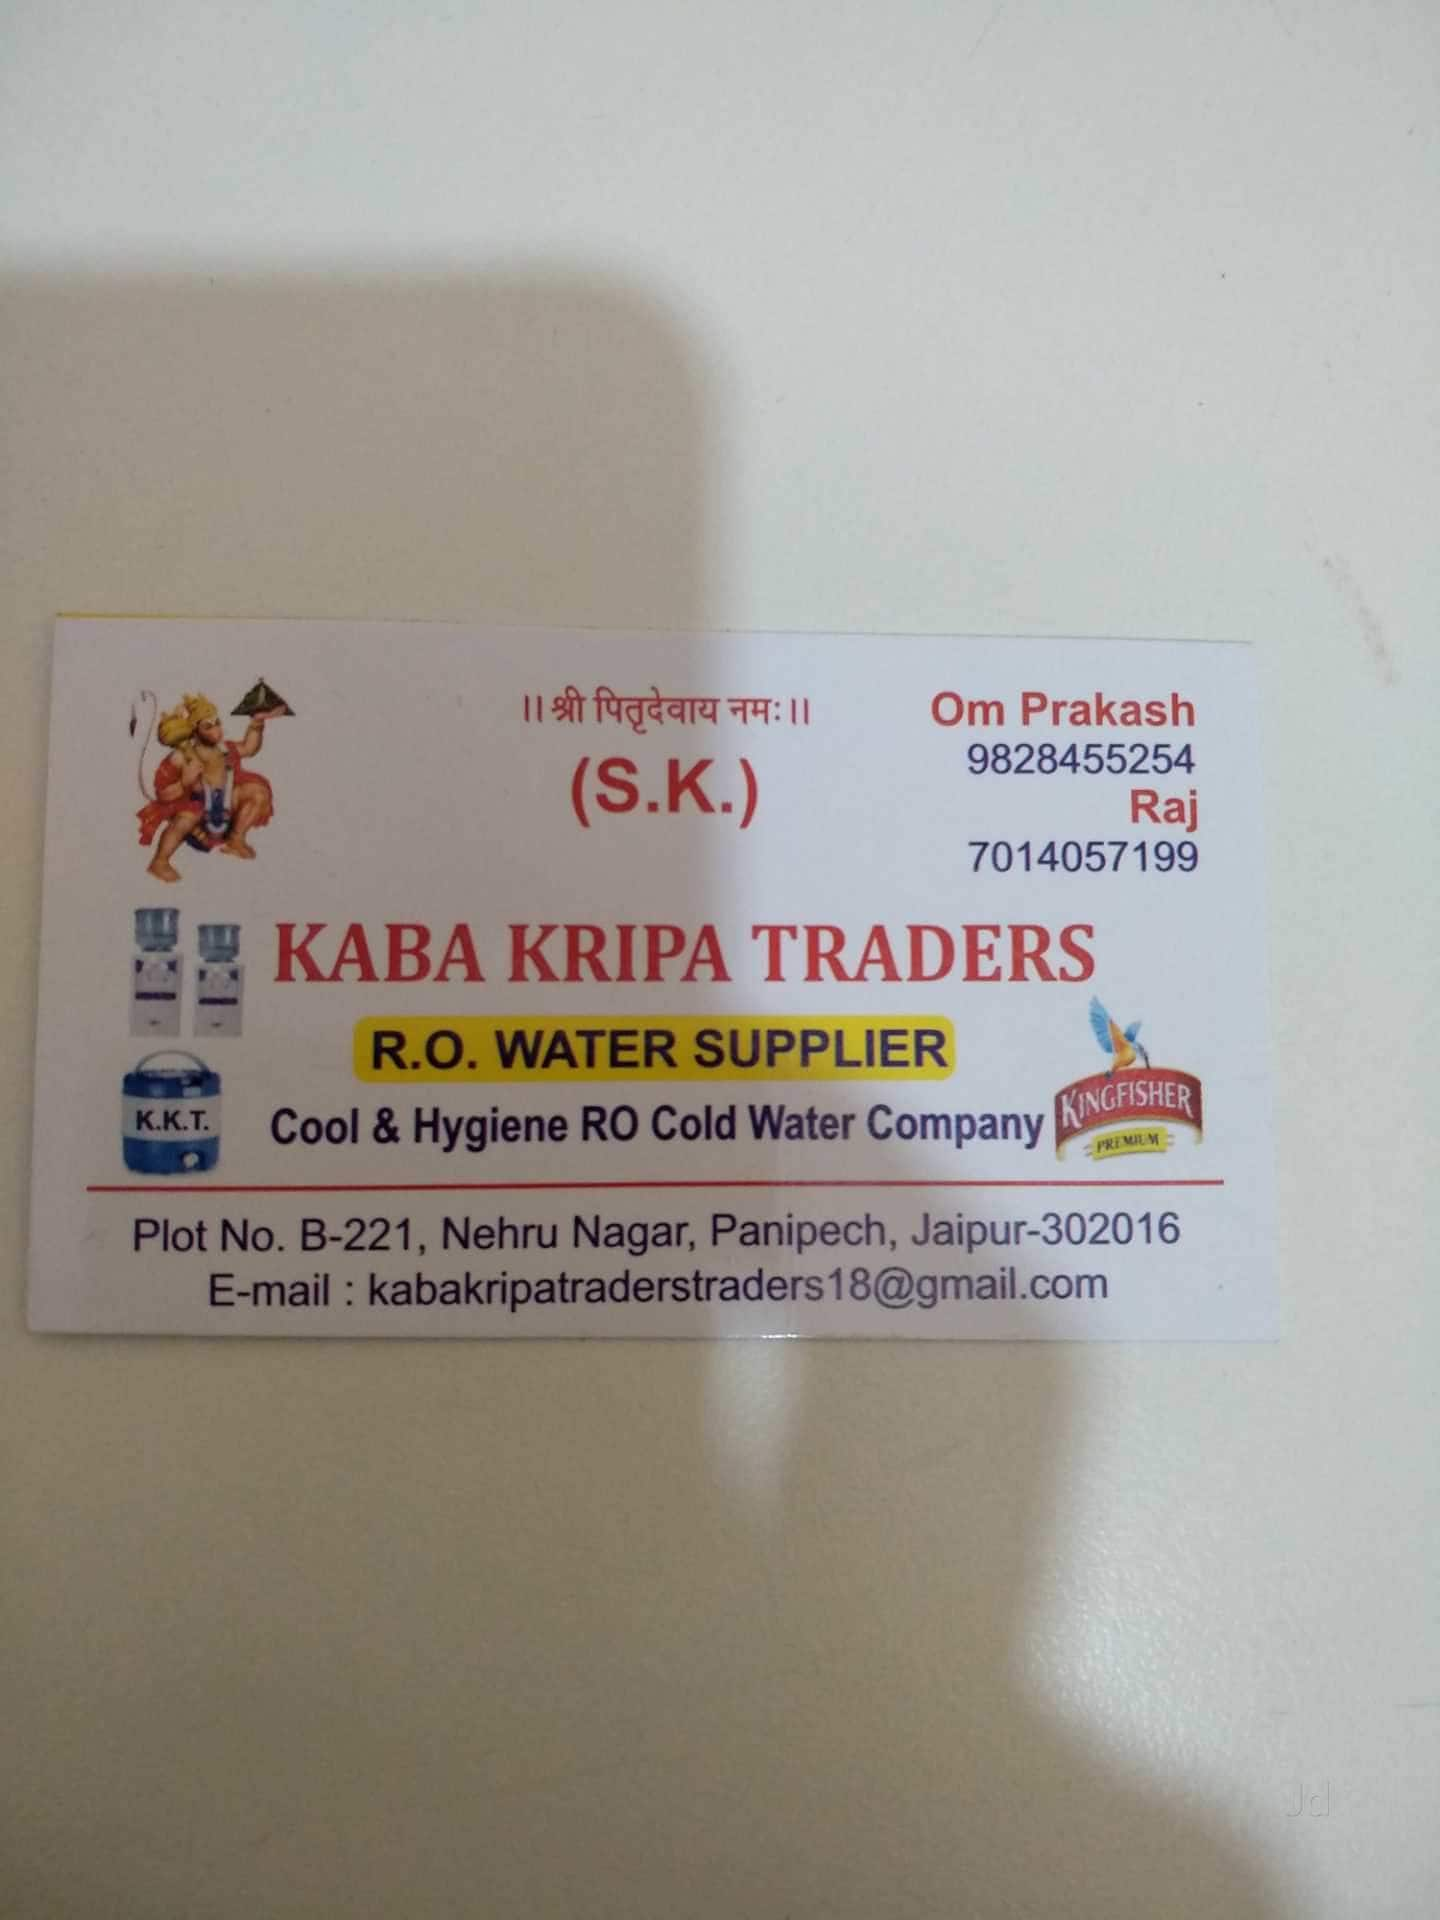 Top Aqua Pure Mineral Water Dealers in Jaipur - Best Aqua Pure